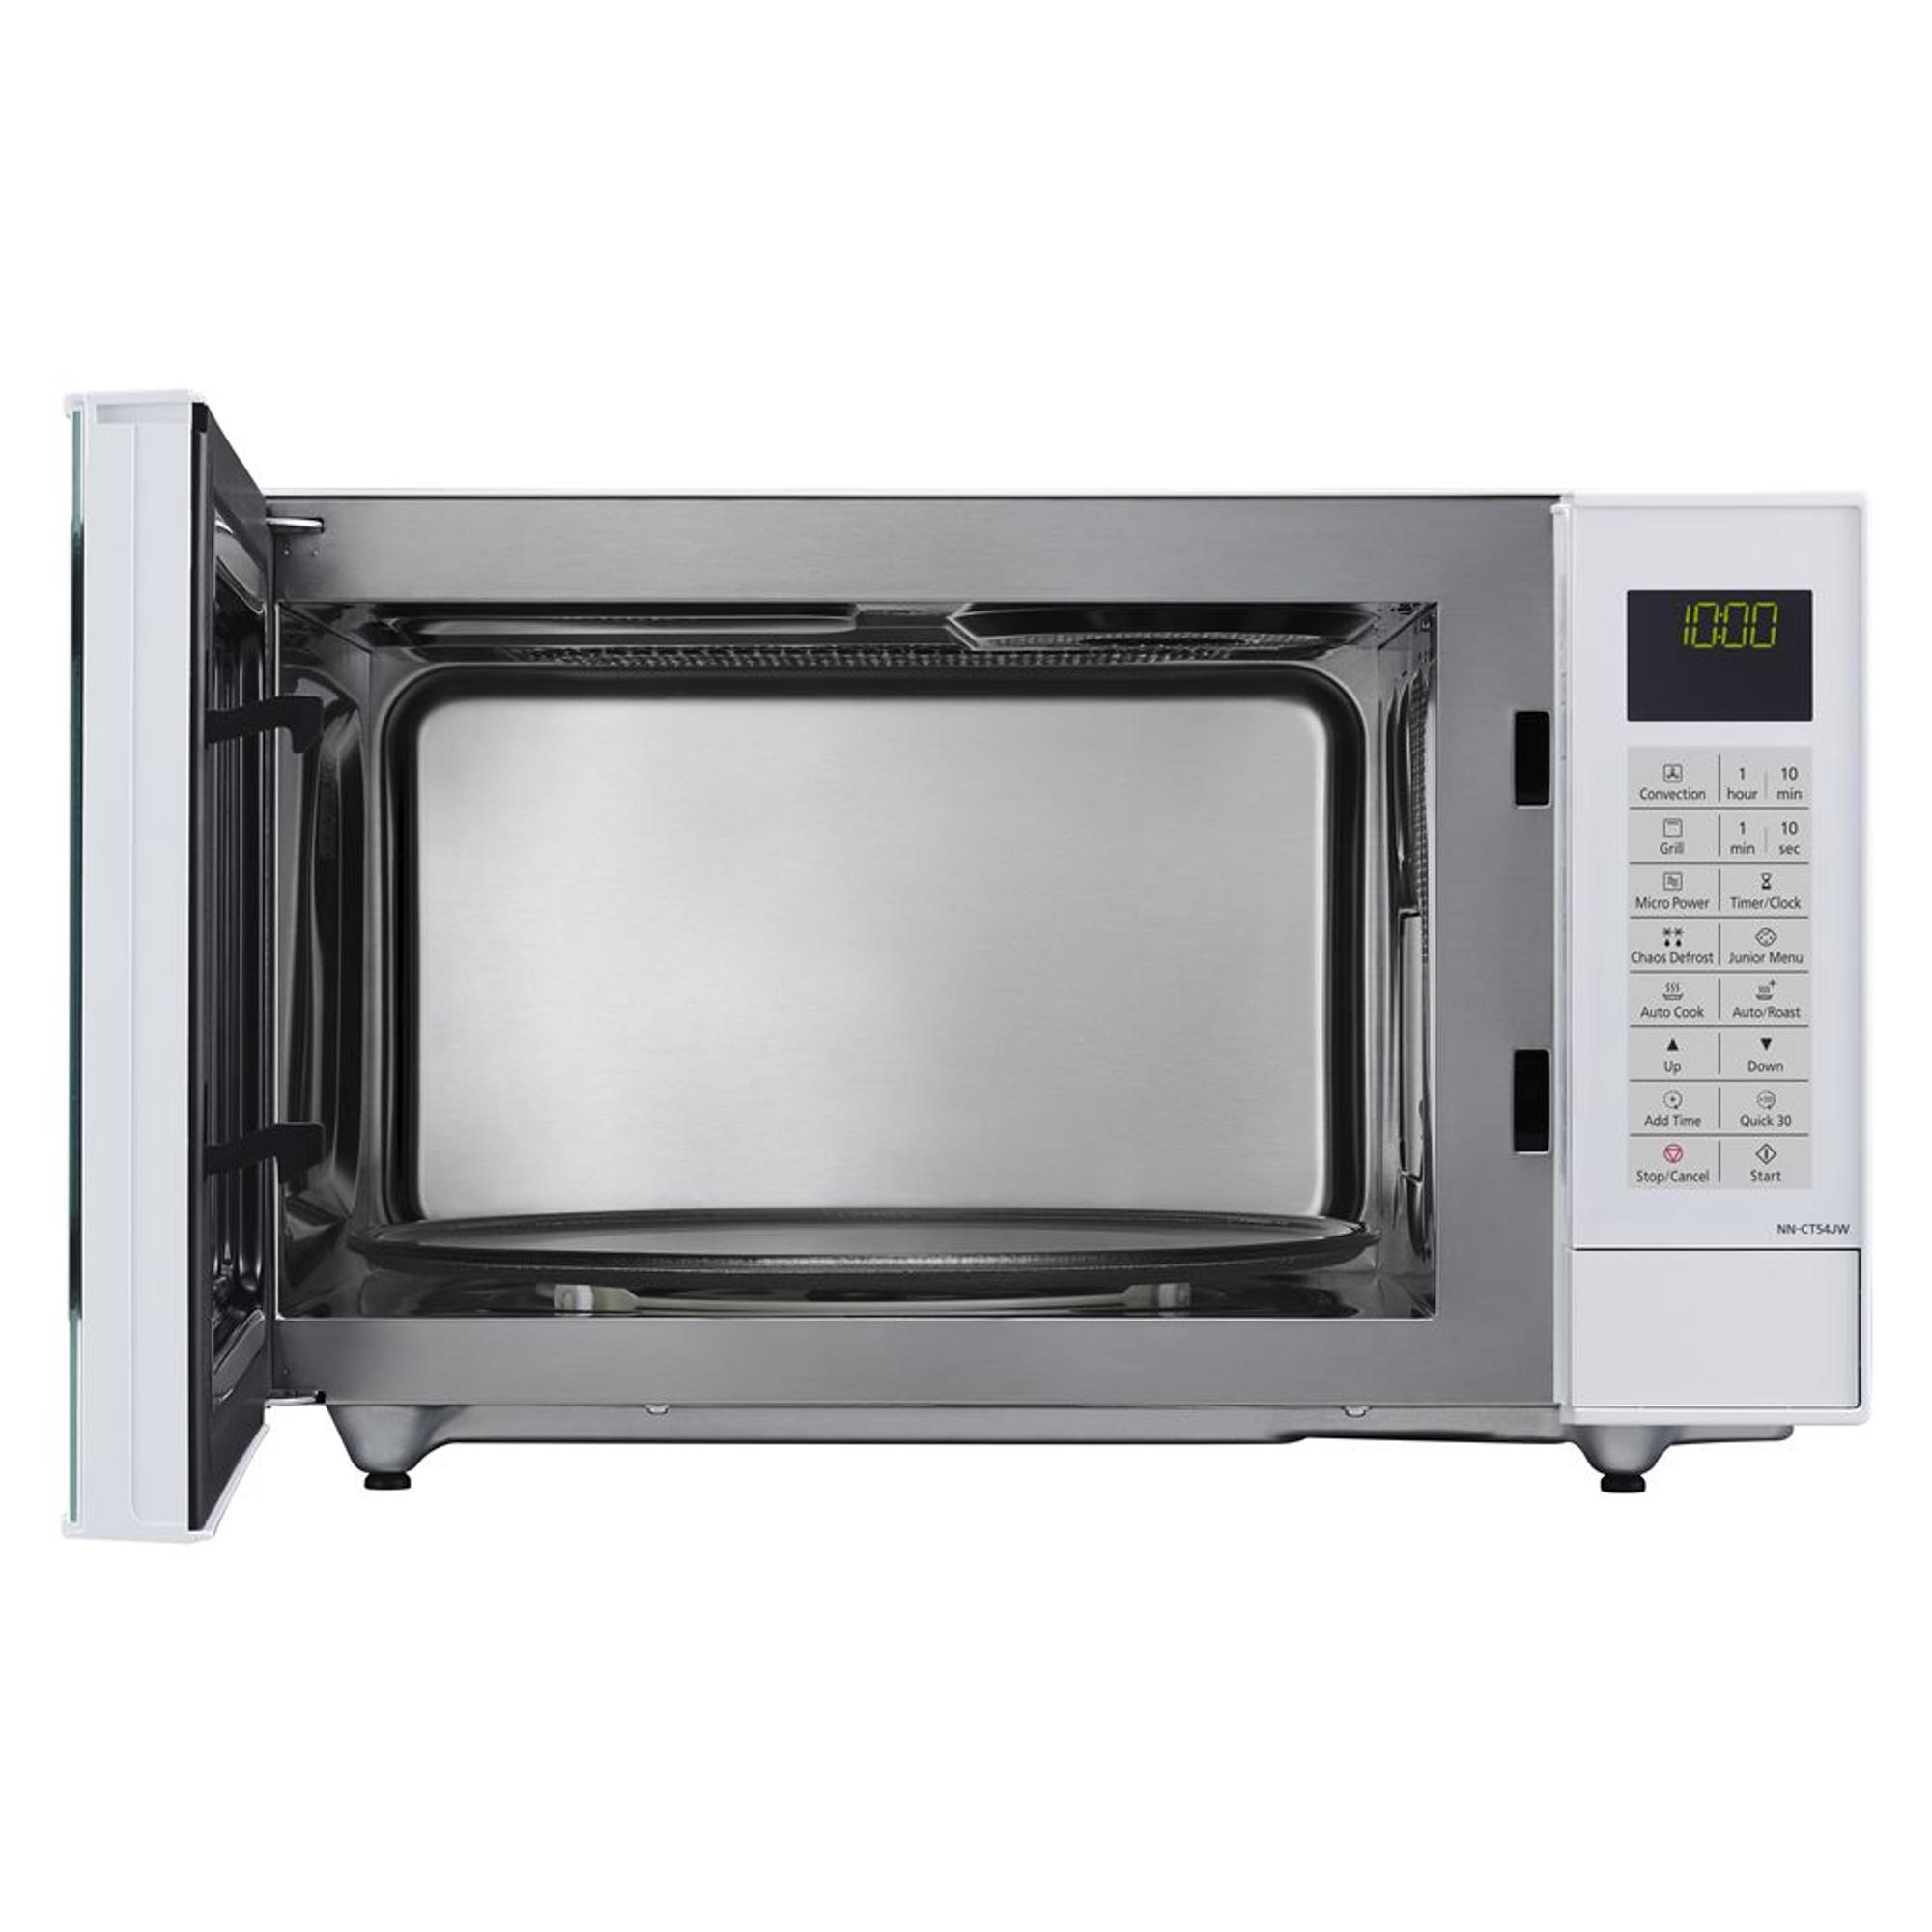 Panasonic NNCT54JWBPQ 1000W Combination Microwave